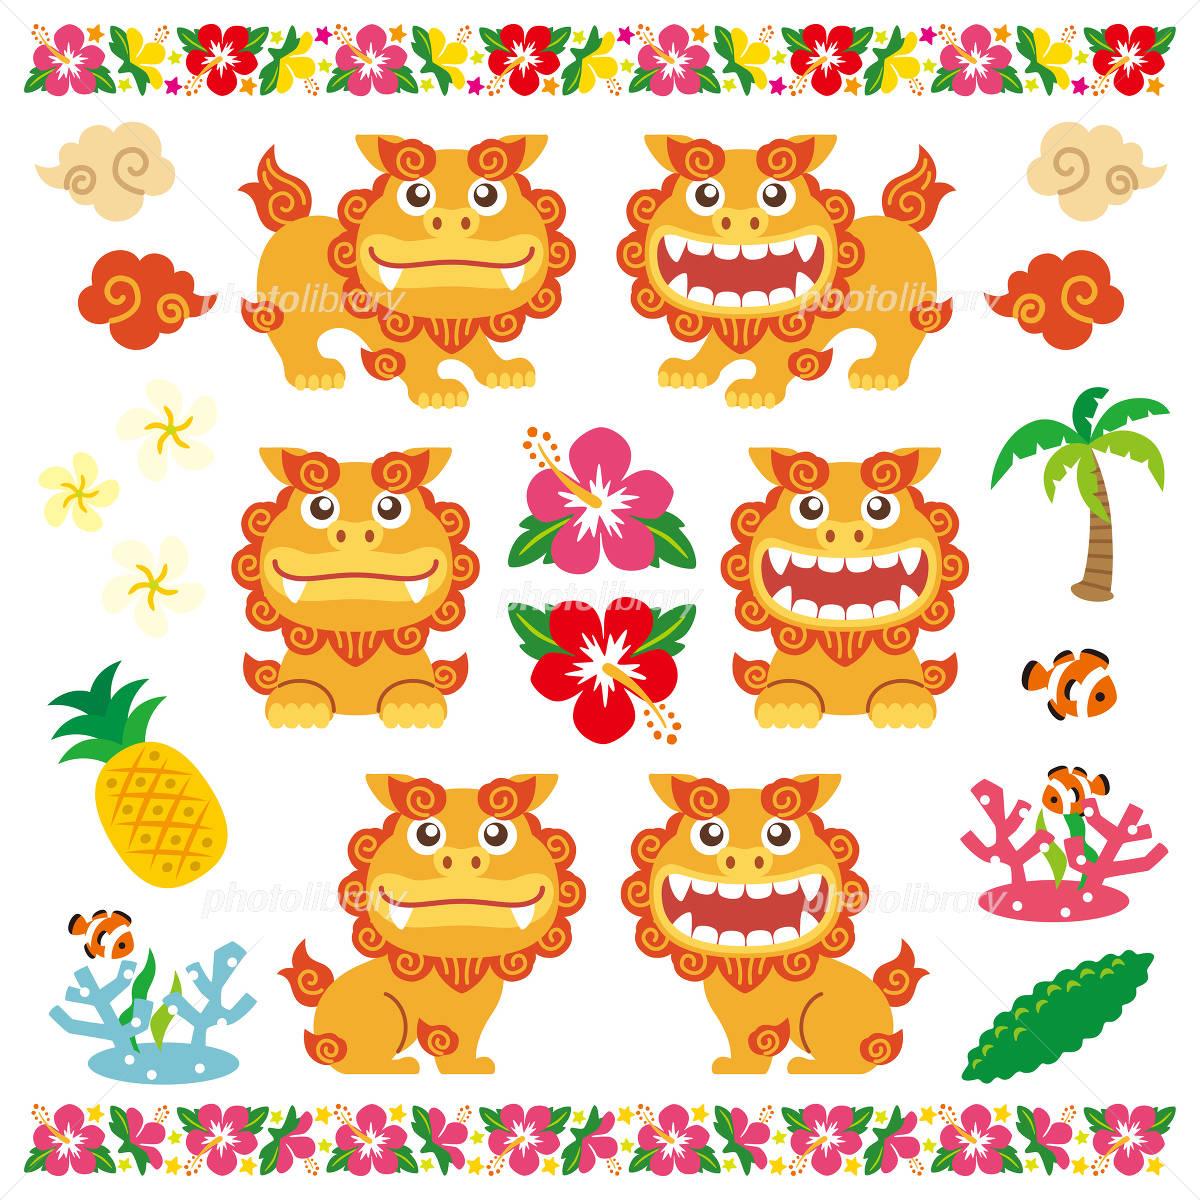 Cute material Okinawa イラスト素材